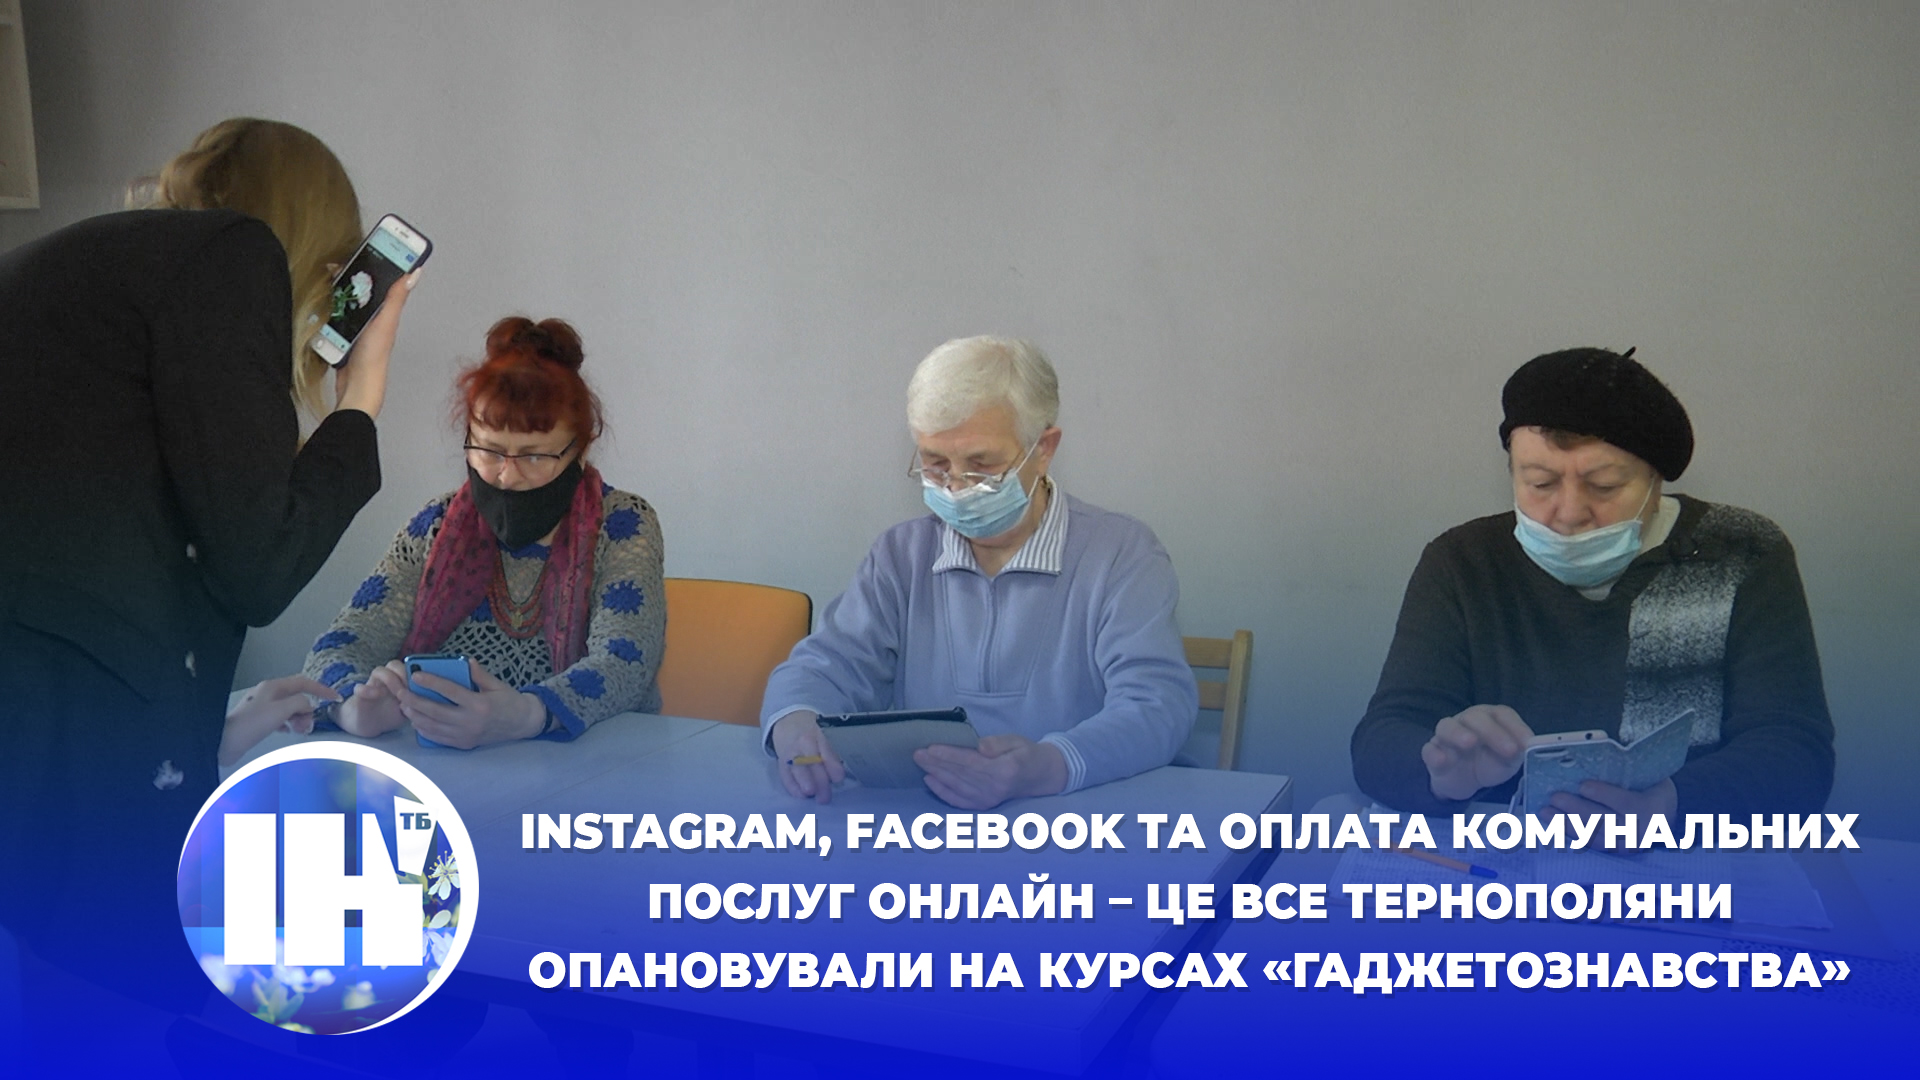 Instagram, Facebook та оплата комунальних послуг онлайн – це все тернополяни опановували на курсах «гаджетознавства»